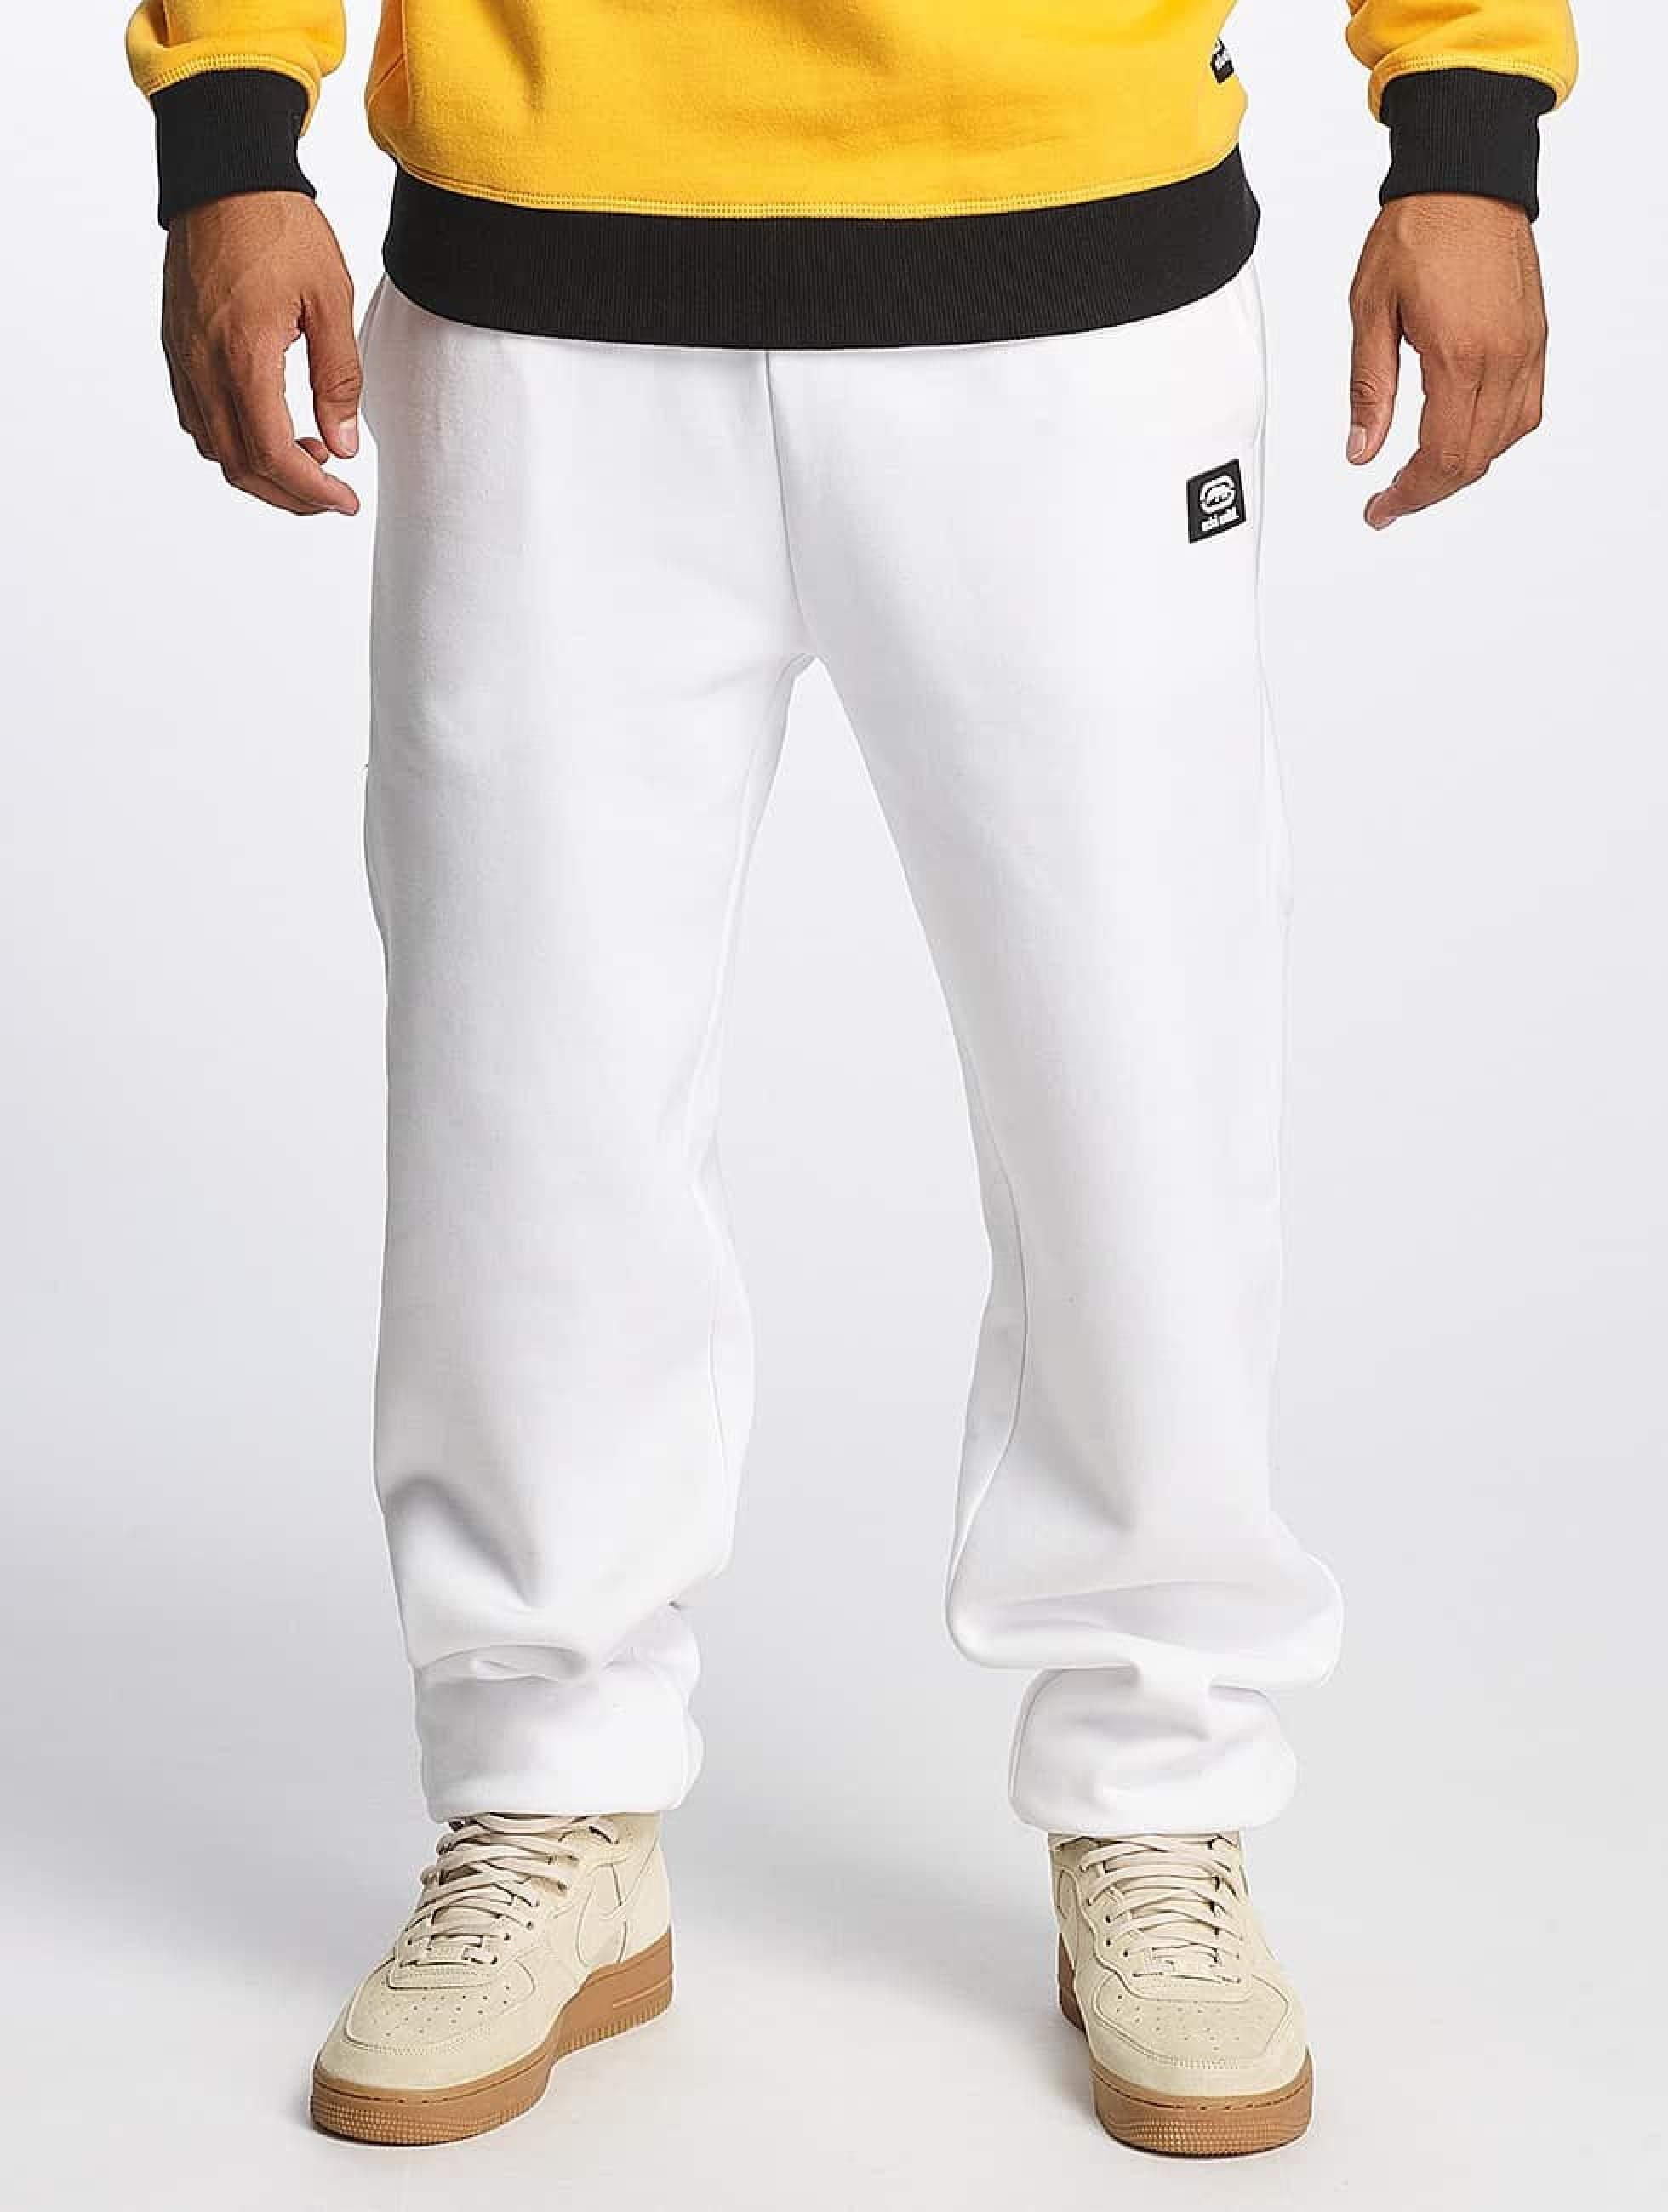 Ecko Unltd. / Sweat Pant SkeletonCoast in white M